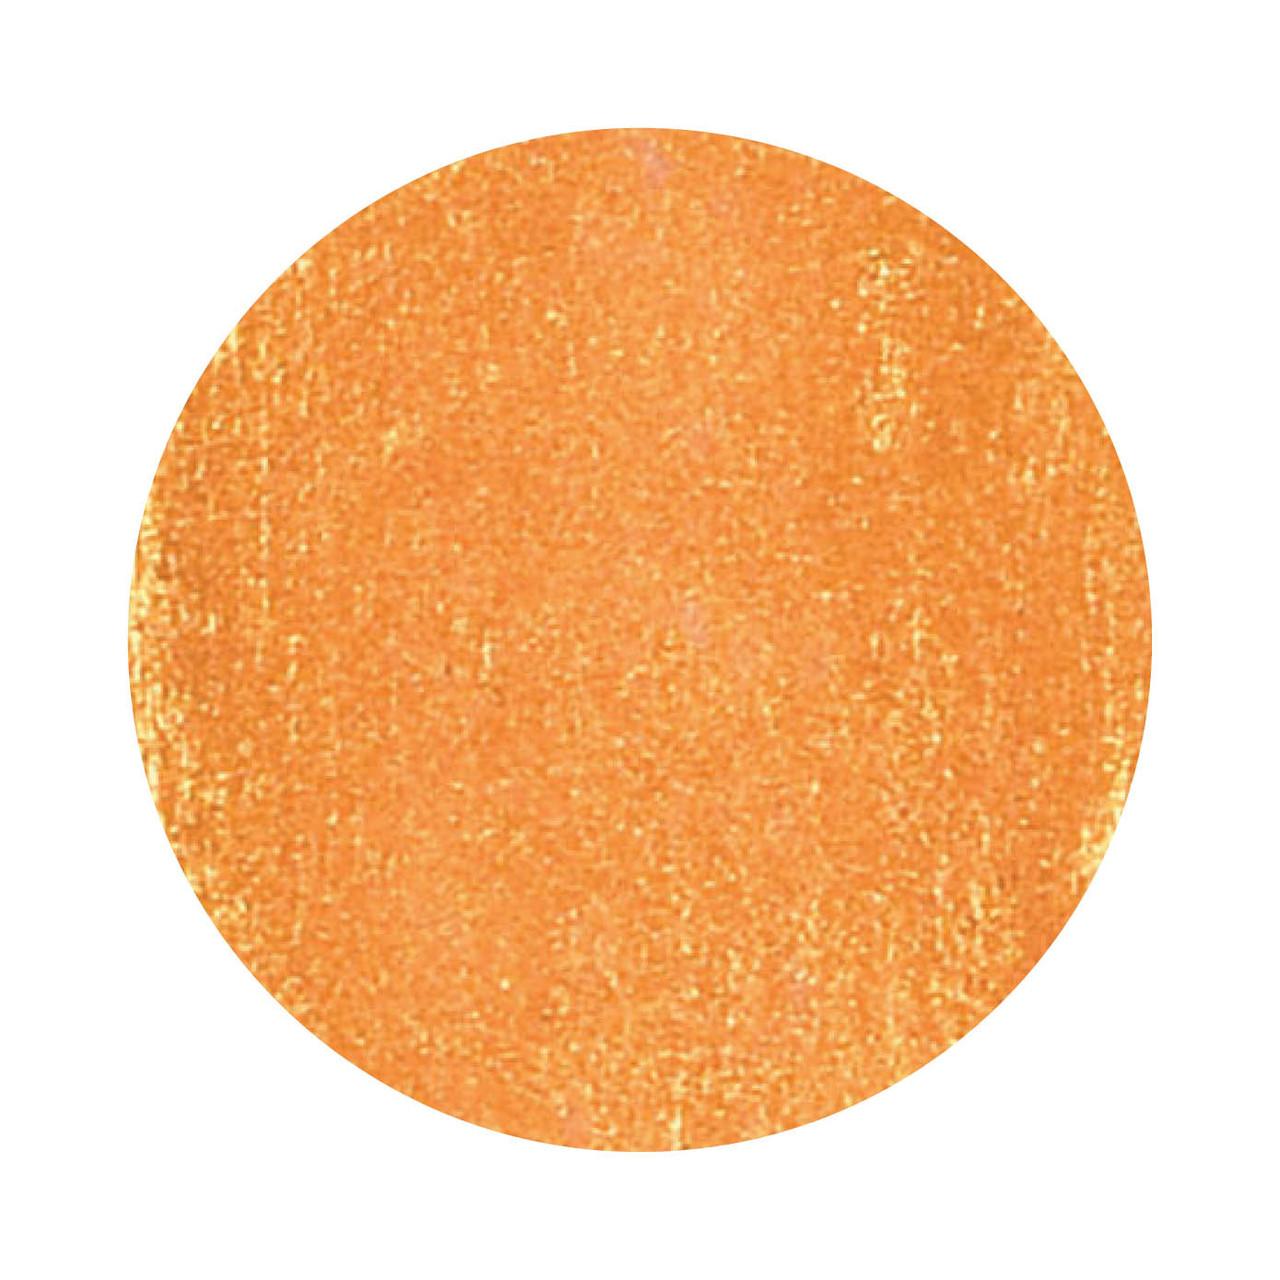 Gold Polish on fondant